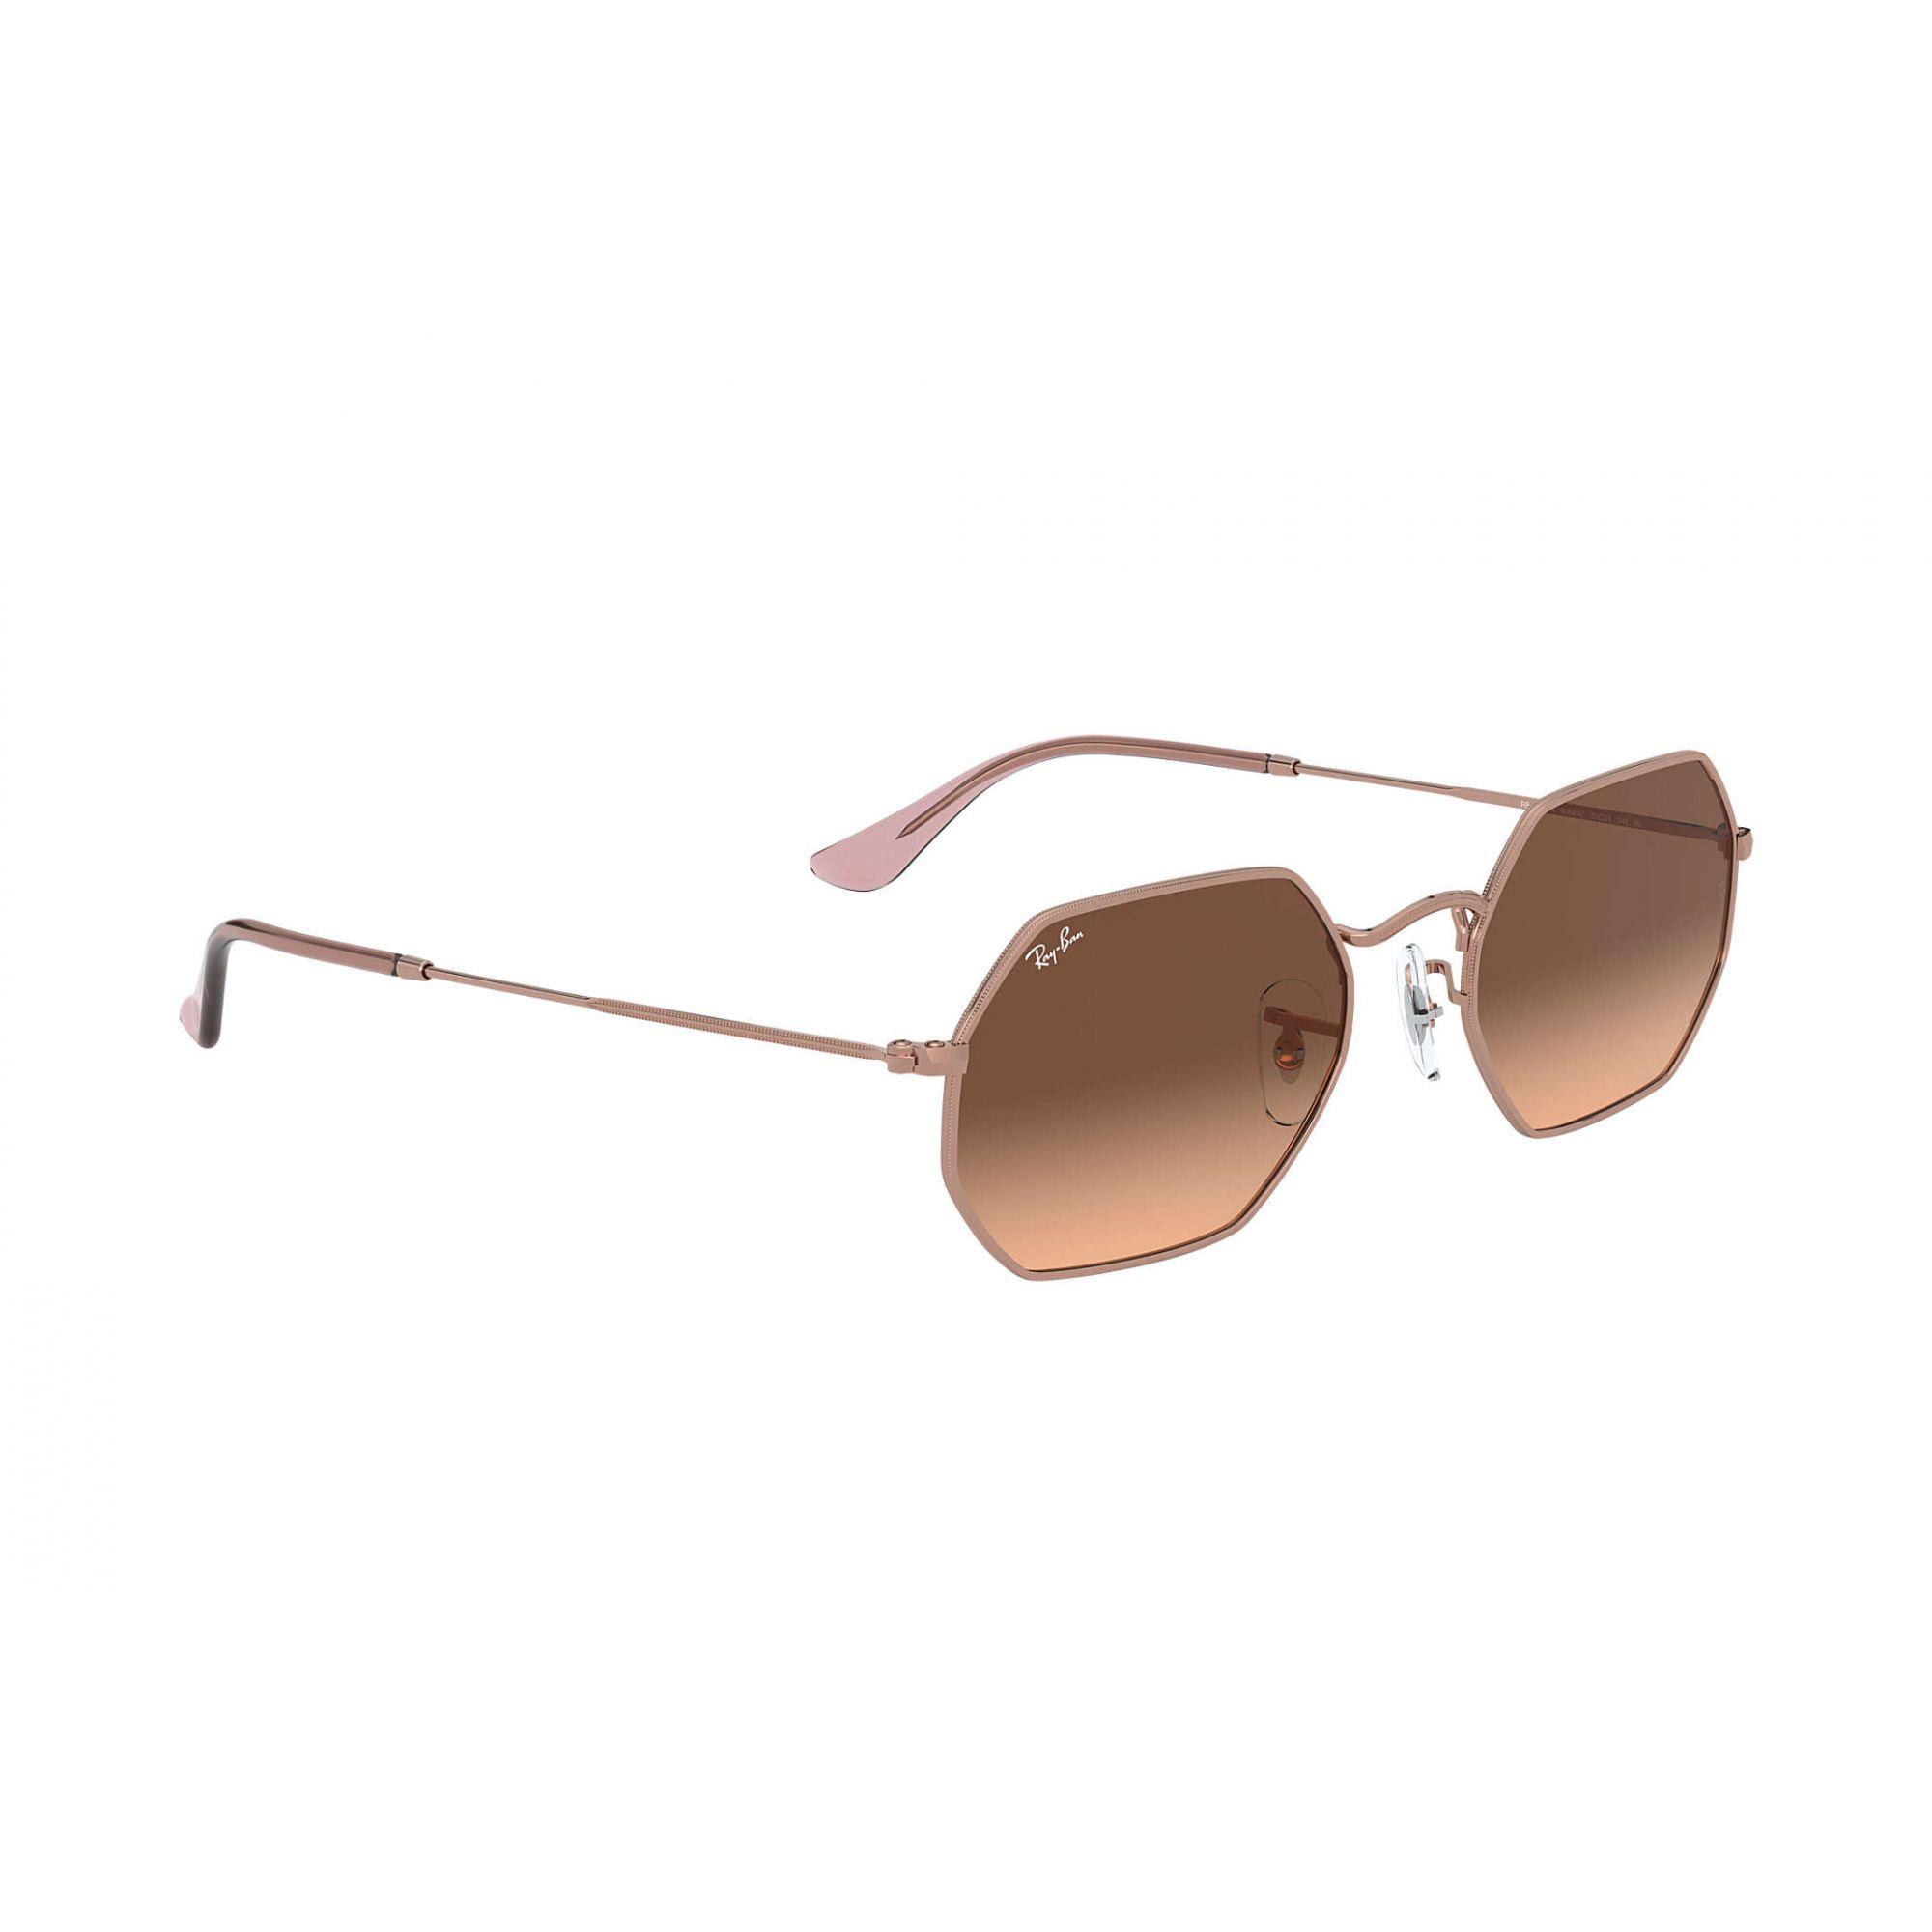 Ray Ban - RB3556N 9069A5 - Óculos de sol